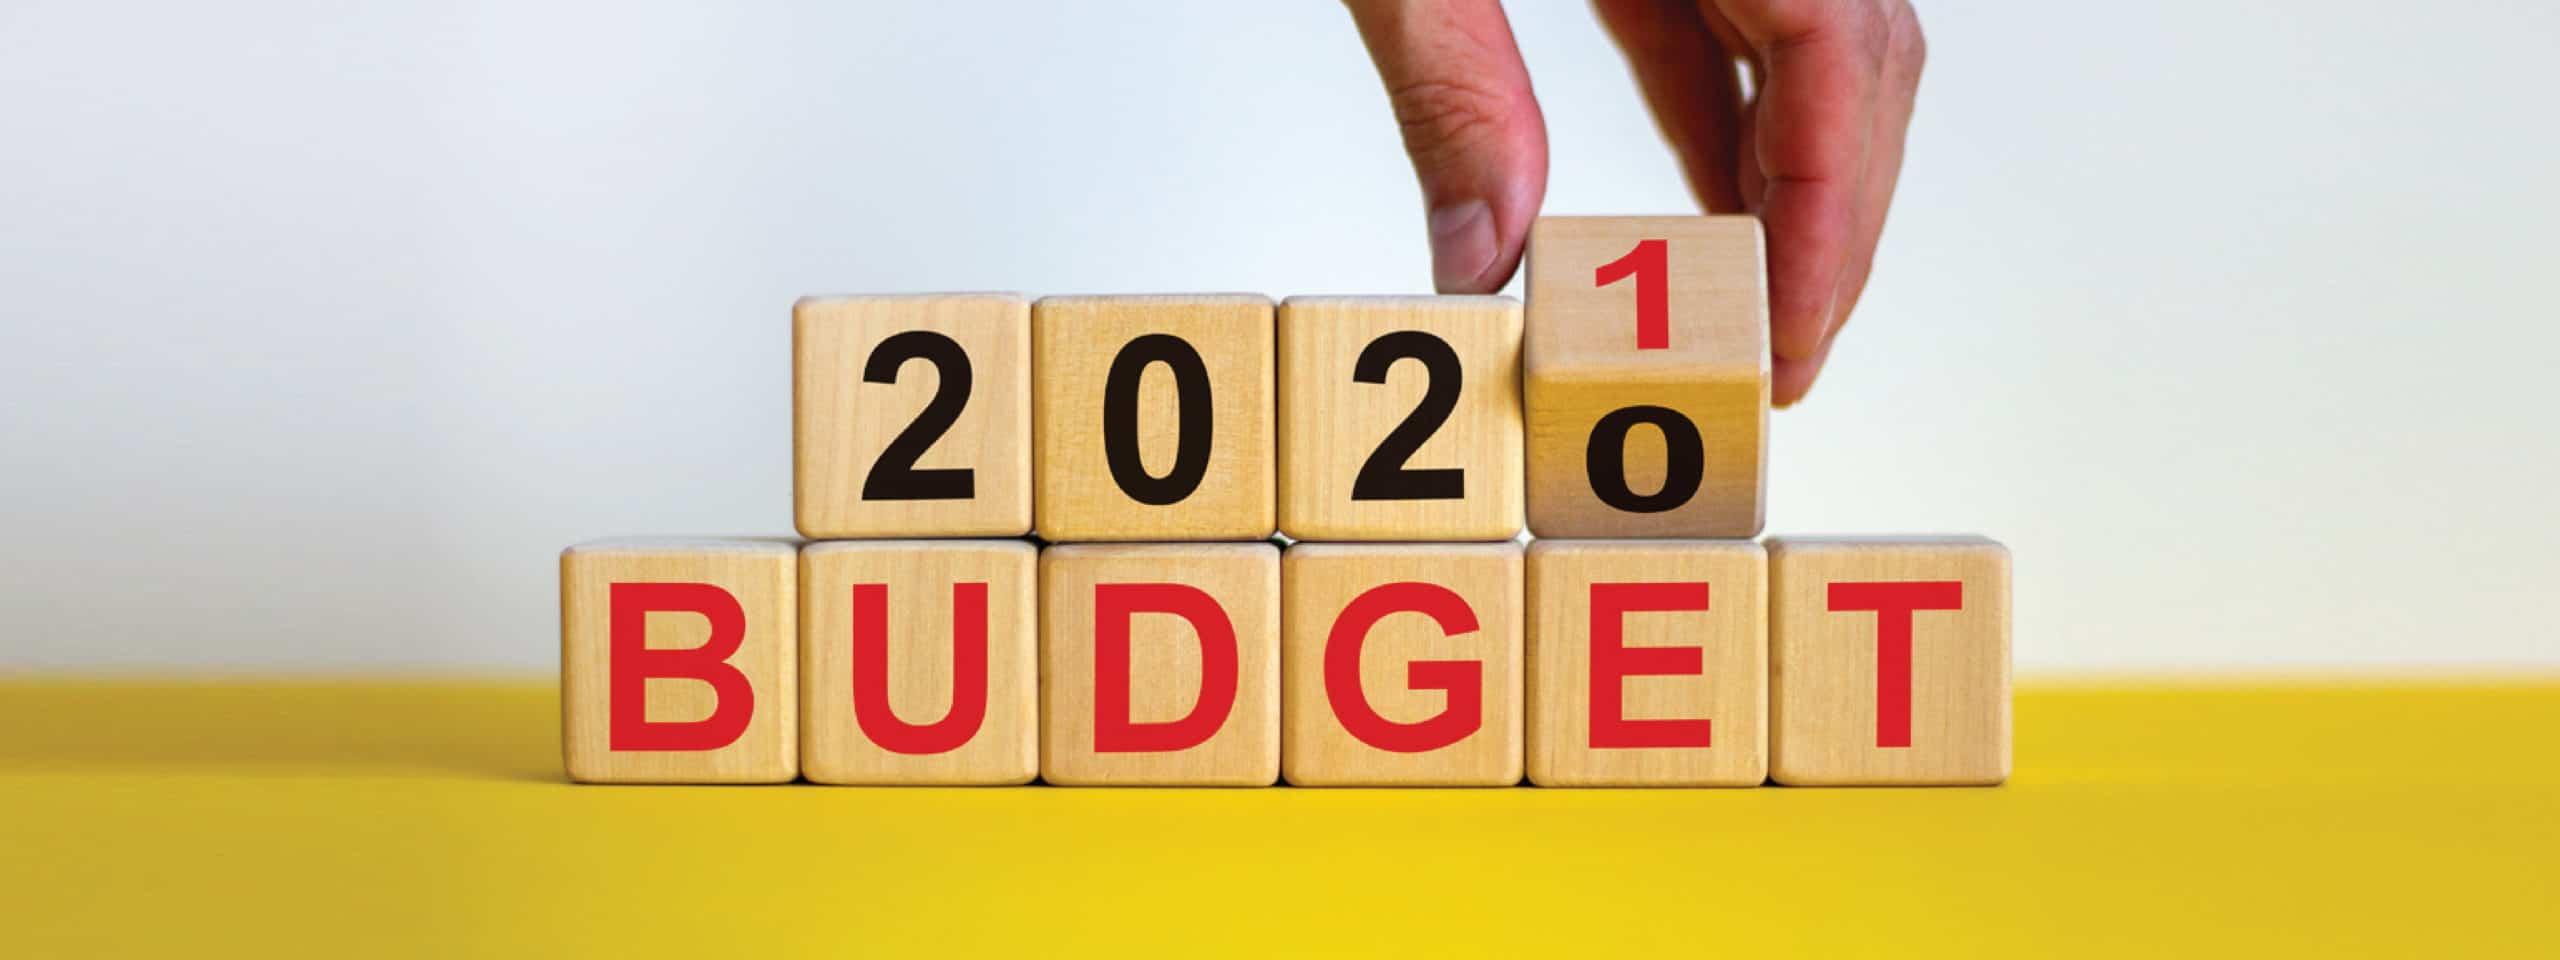 Australian Federal Government Budget | Computing Australia